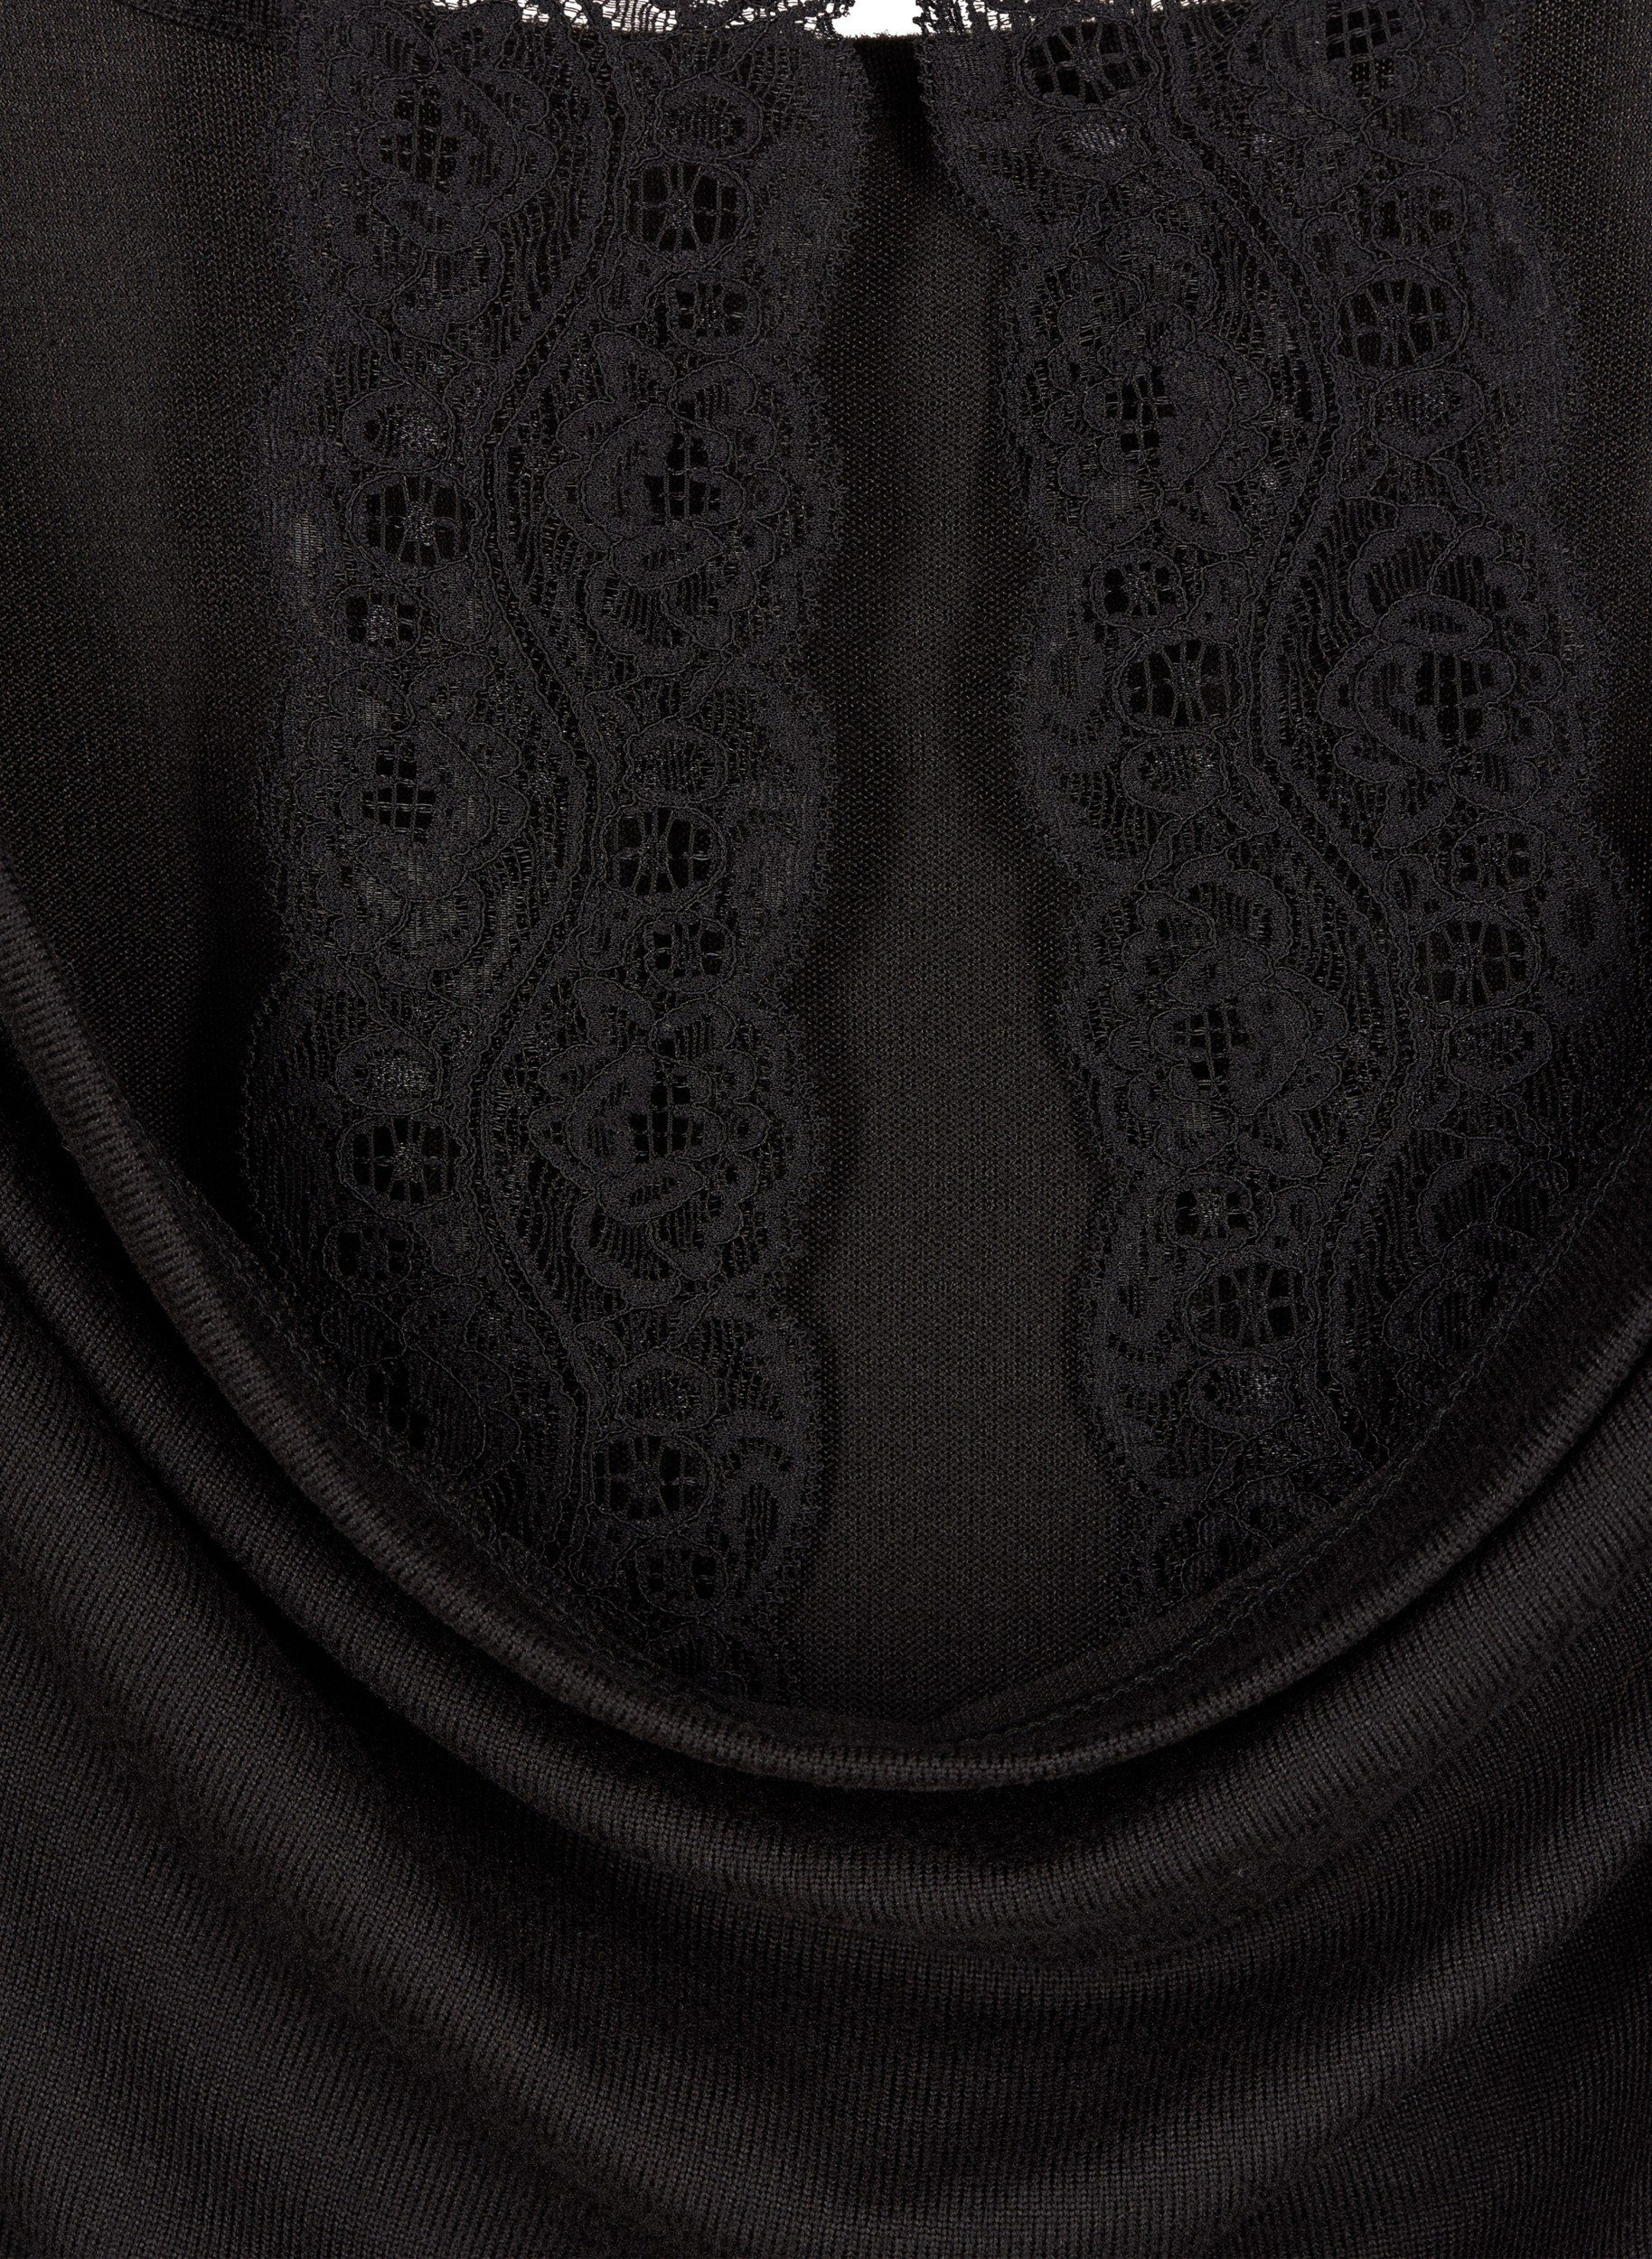 Zizzi Kurzarmbluse Damen Große Größen Bluse Elegant 3/4 Arm Floral Spitze Spitzenbluse Online Kaufen